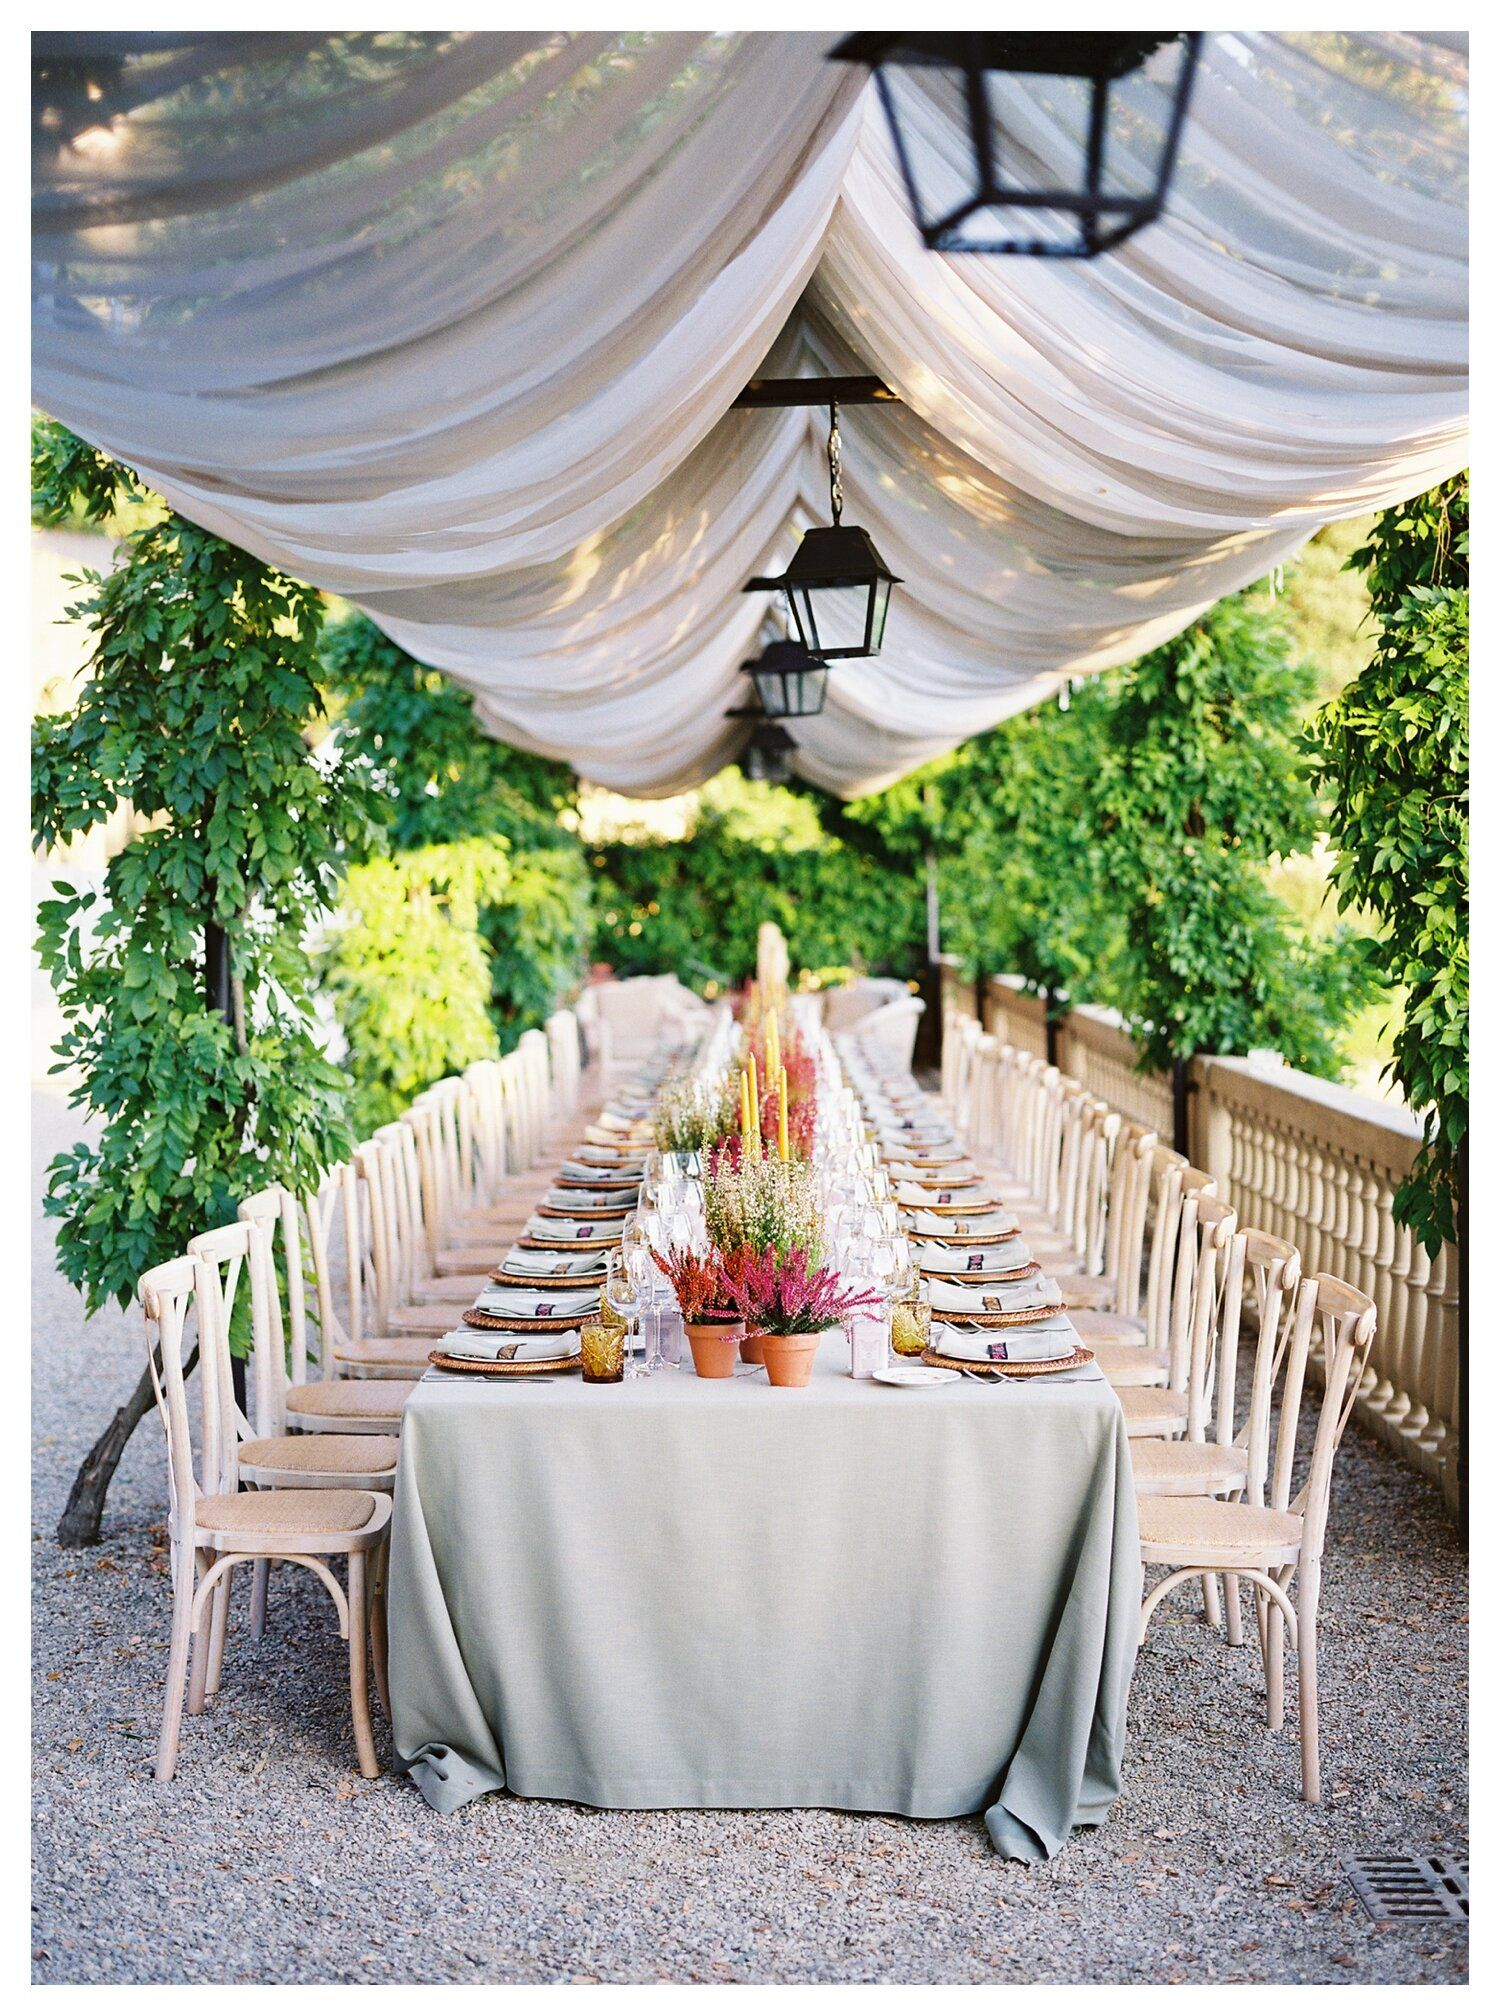 Wedding Rehearsal Dinner At Villa Le Fontanelle Williamsburg Photo Studios In 2020 Tuscany Wedding Venue Italy Wedding Tuscany Wedding Theme